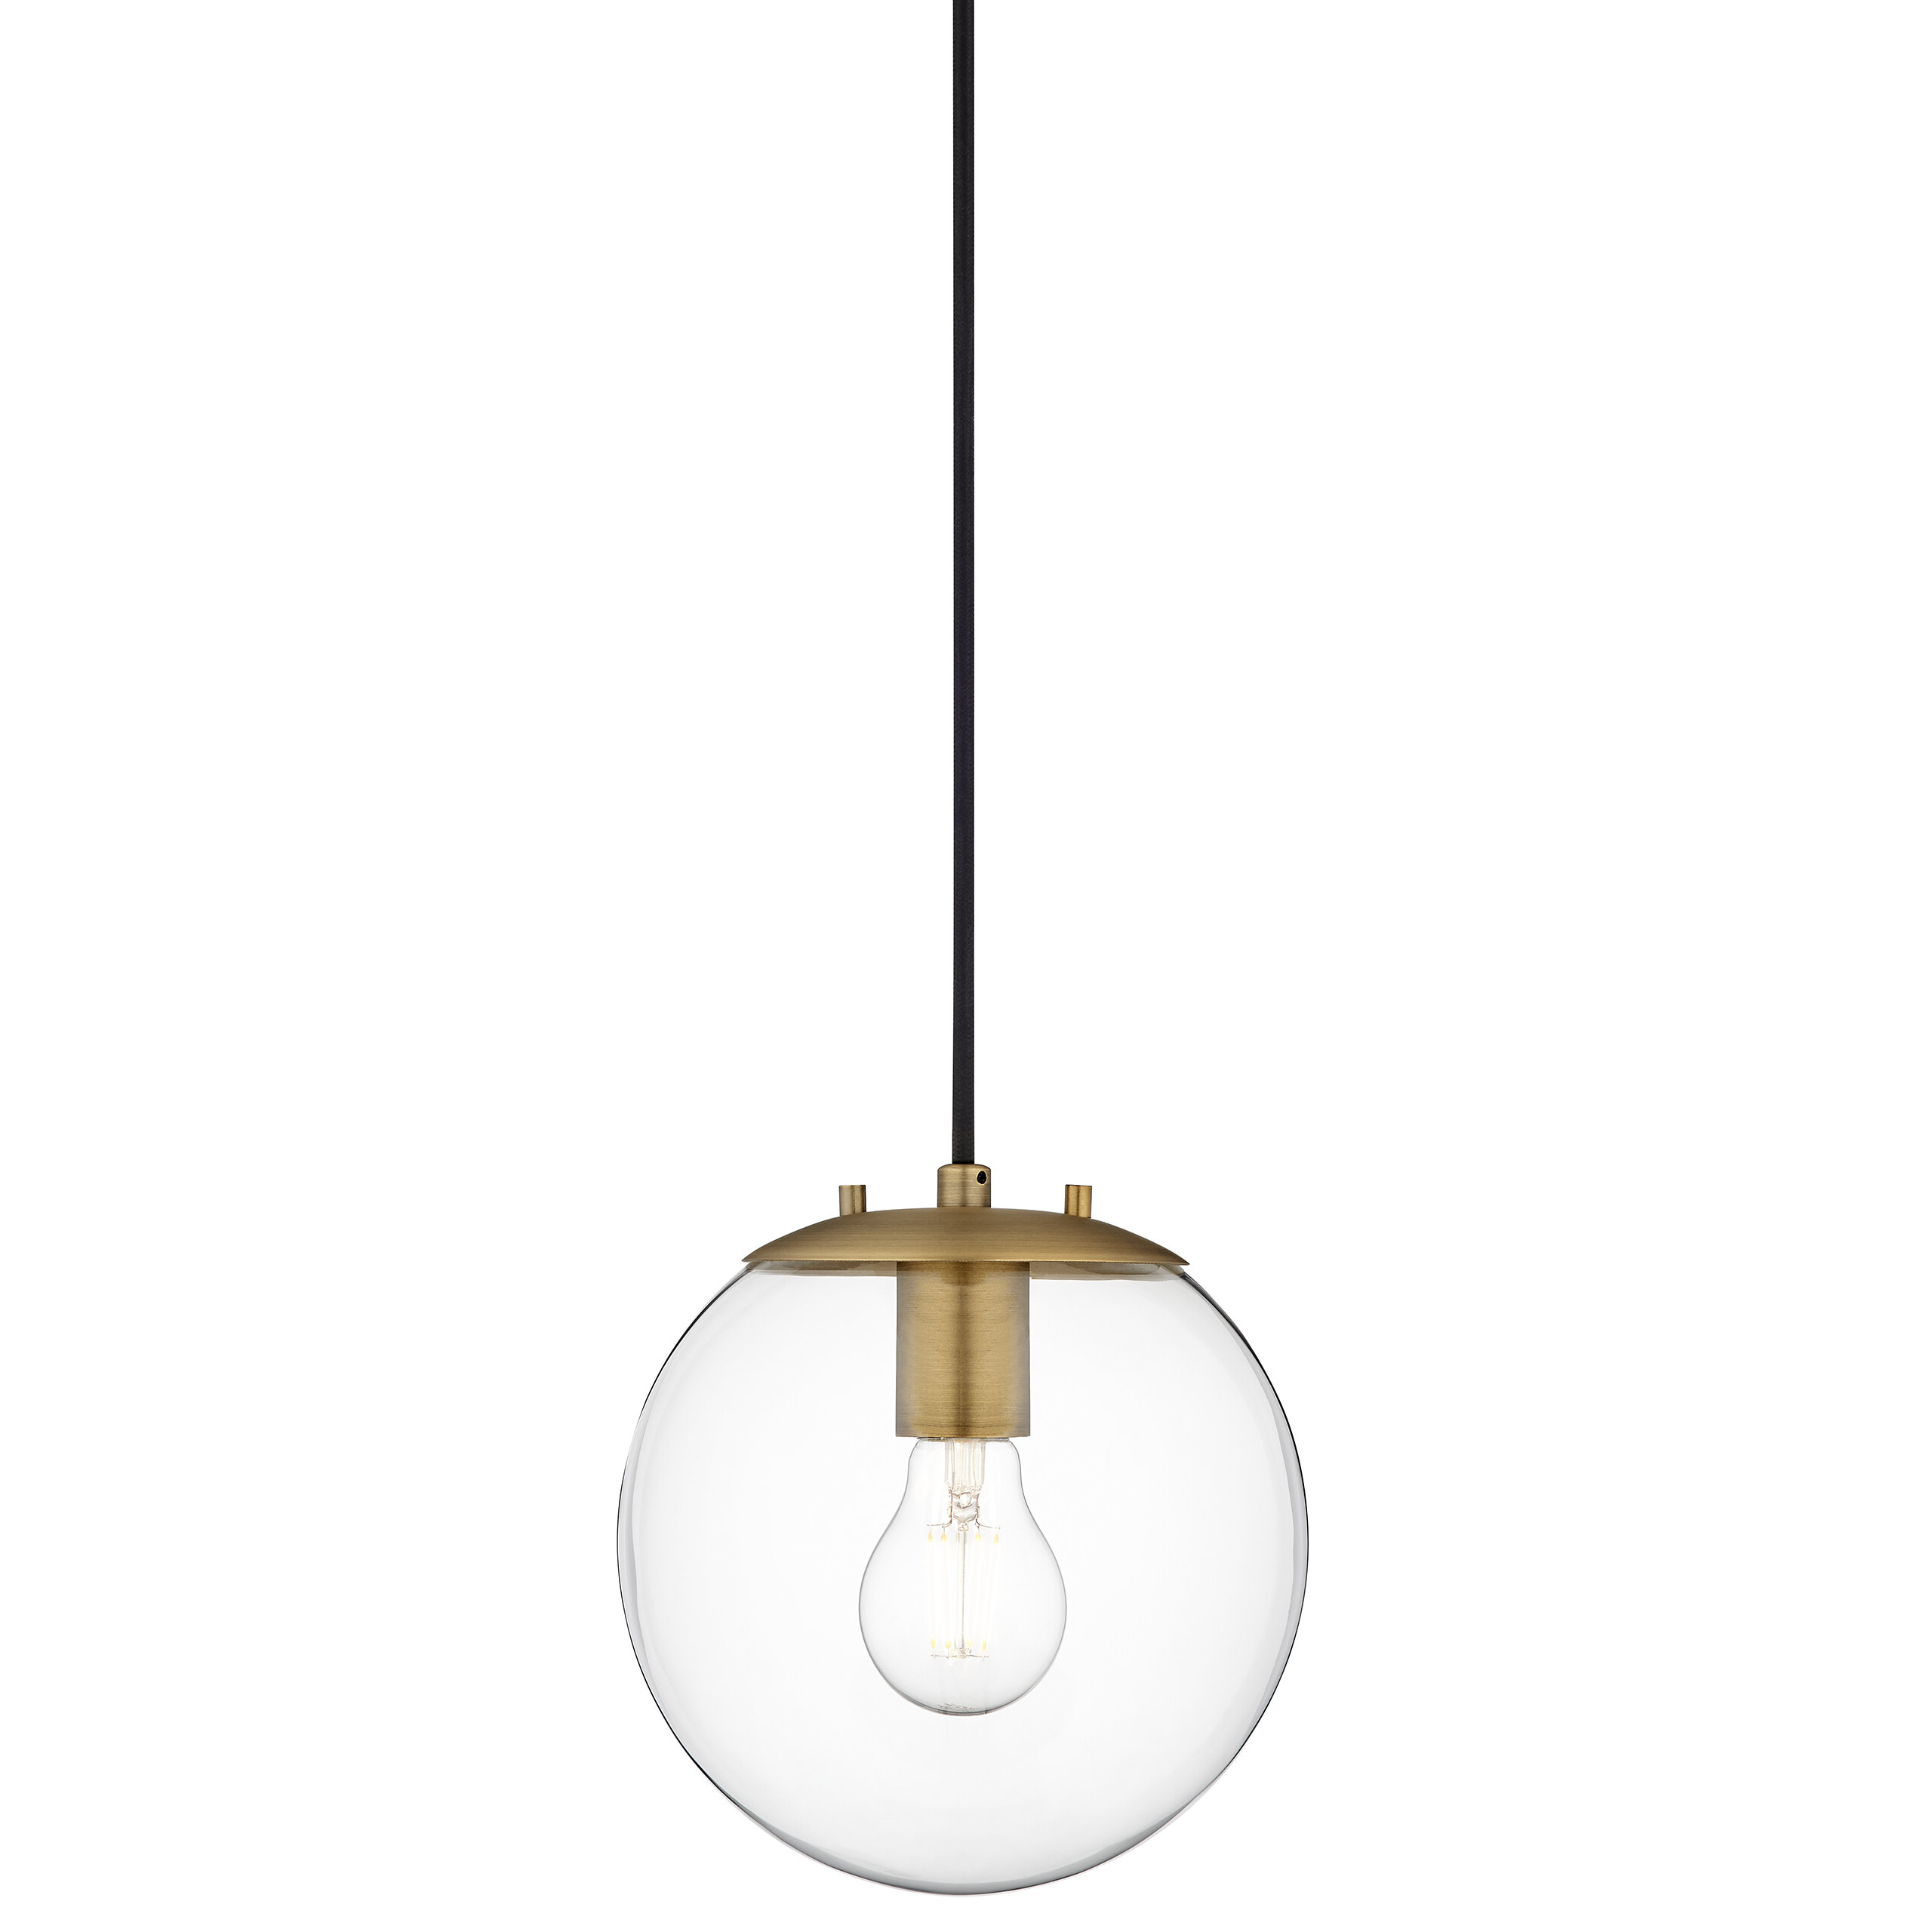 Famous Bundy 1 Light Single Globe Pendants Inside Wysocki 1 Light Single Globe Pendant (Gallery 10 of 20)